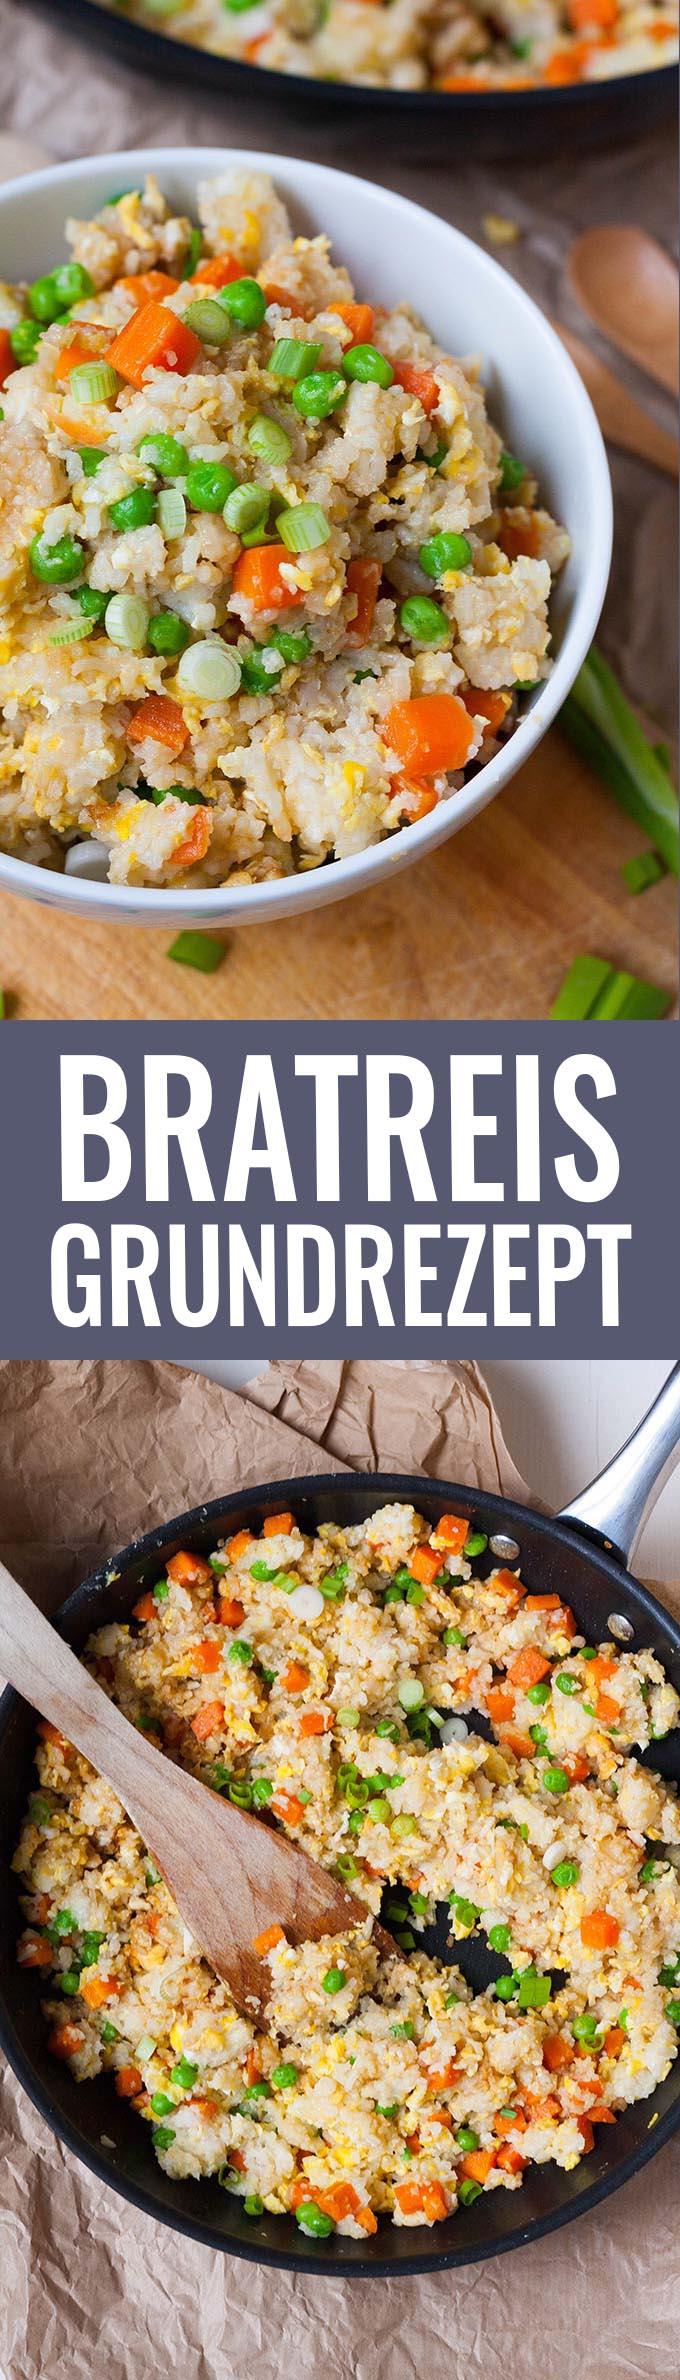 Bratreis Grundrezept - Kochkarussell.com